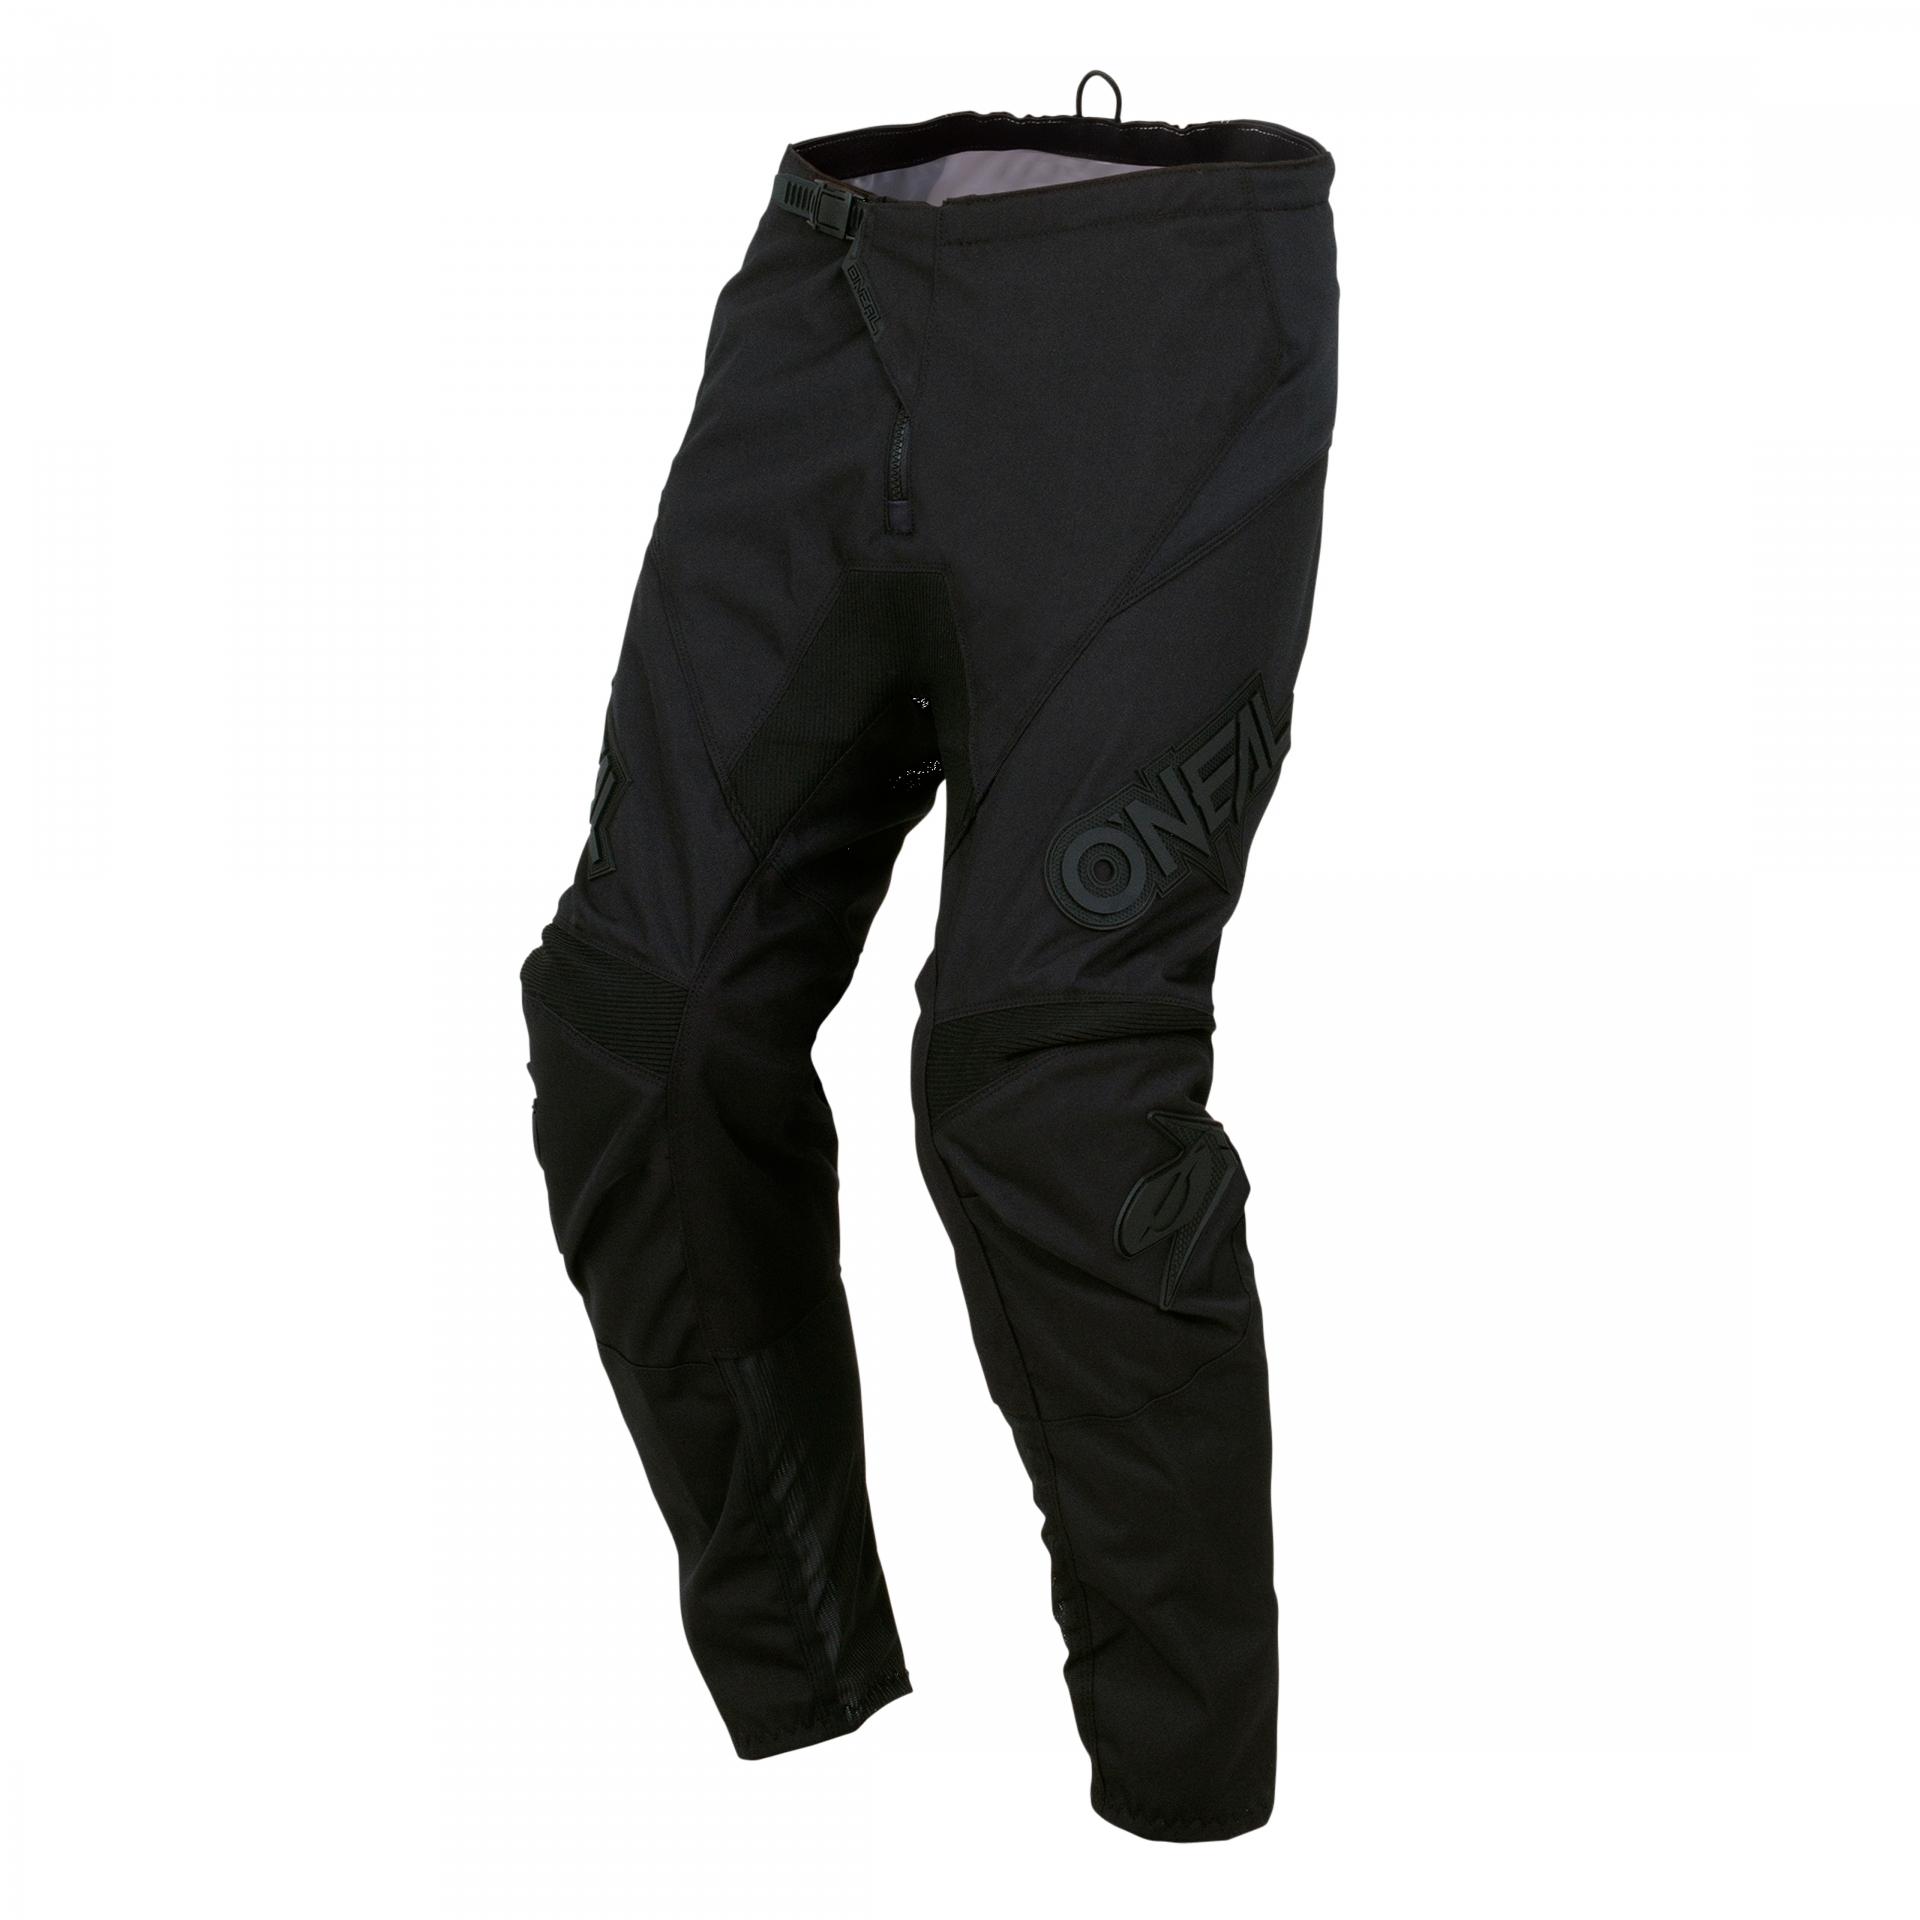 Pantalon MX O'Neal Element Classic Noir - 32